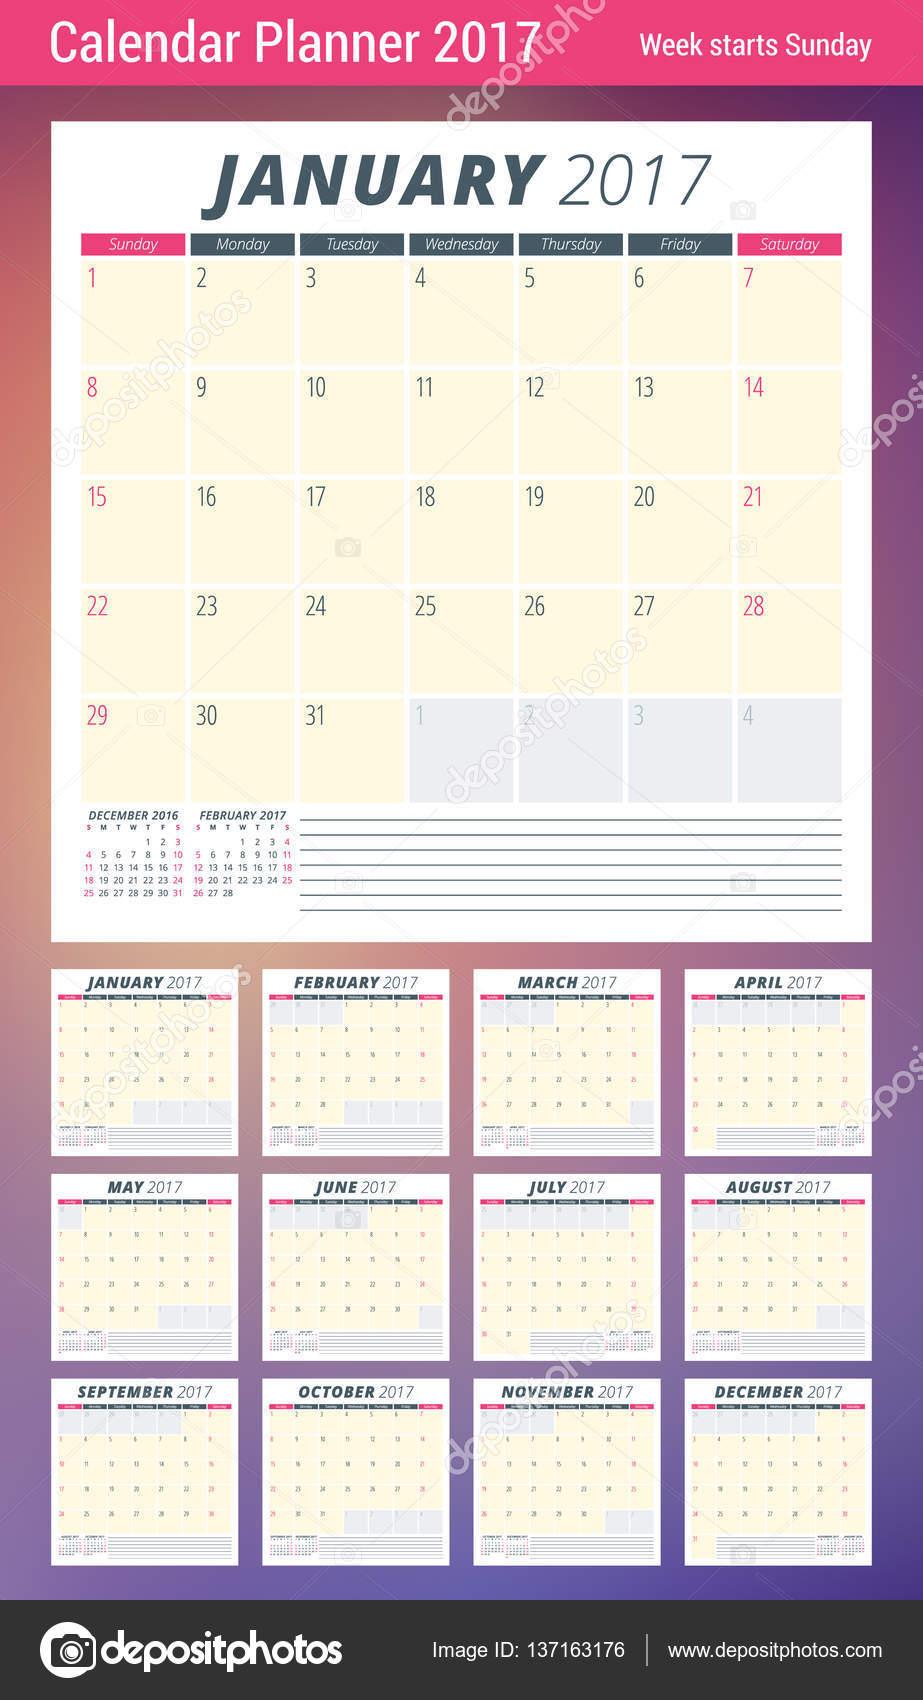 calendar planner template for 2017 year week starts sunday 3